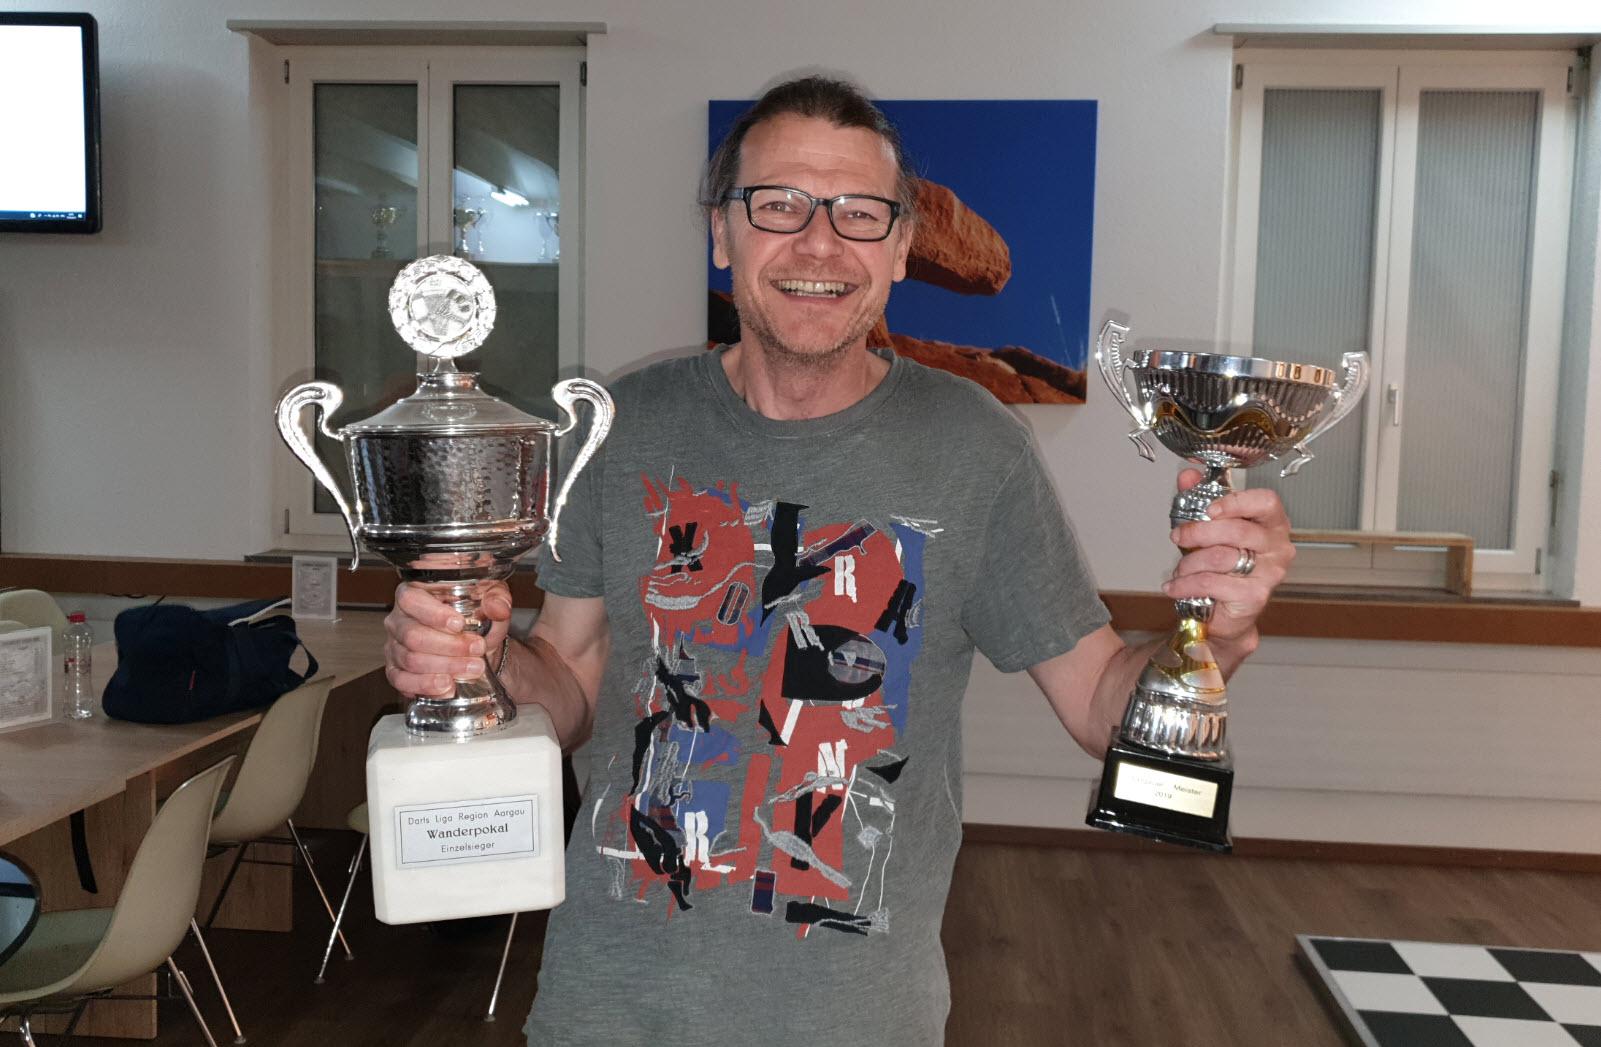 Aargauer Meister 2019 - Bruno Gfeller (DC Sonnenberg - Brugg)